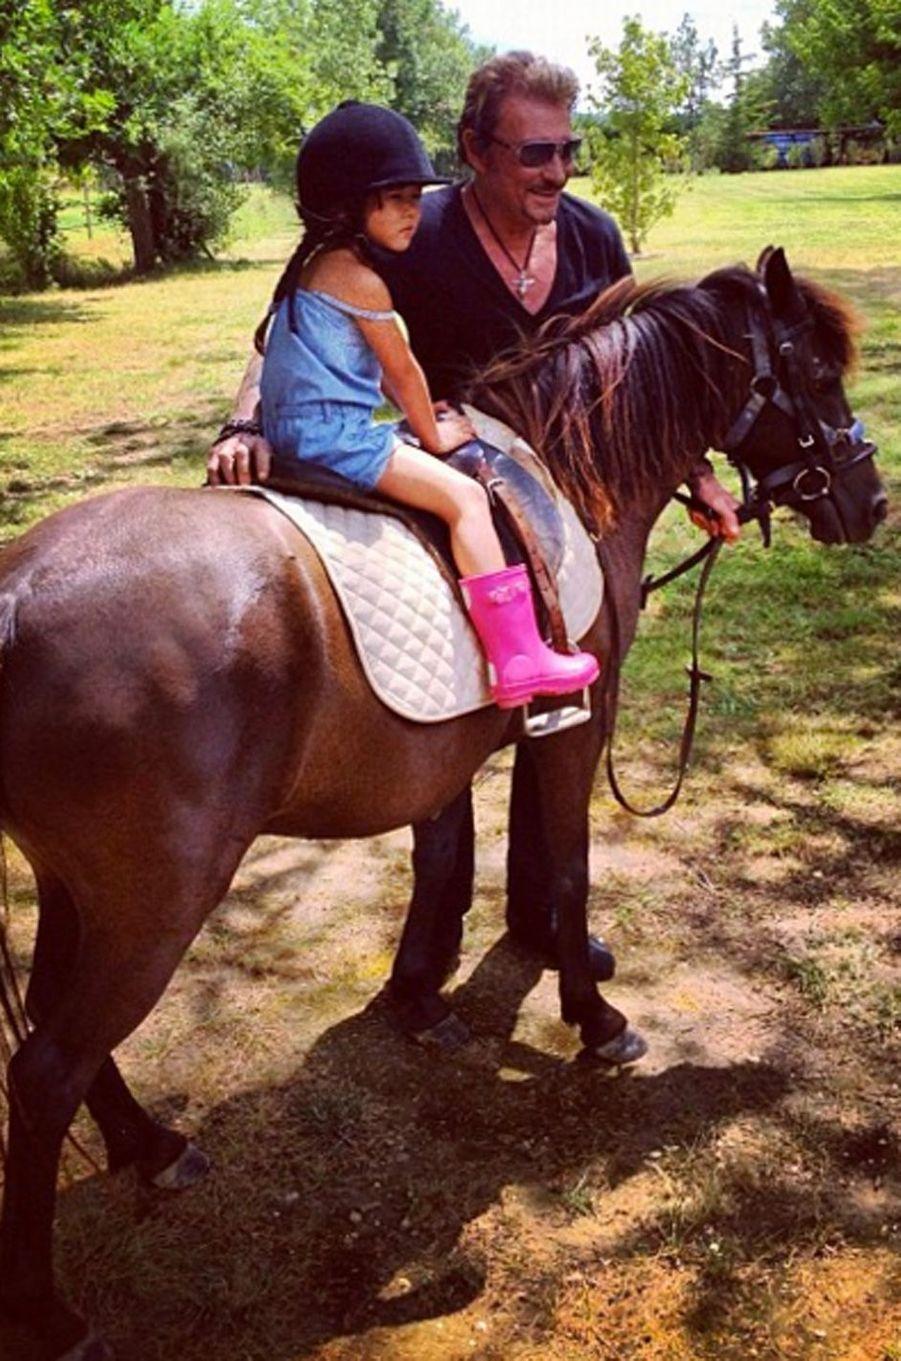 Johnny Hallyday guide sa petite fille sur un cheval